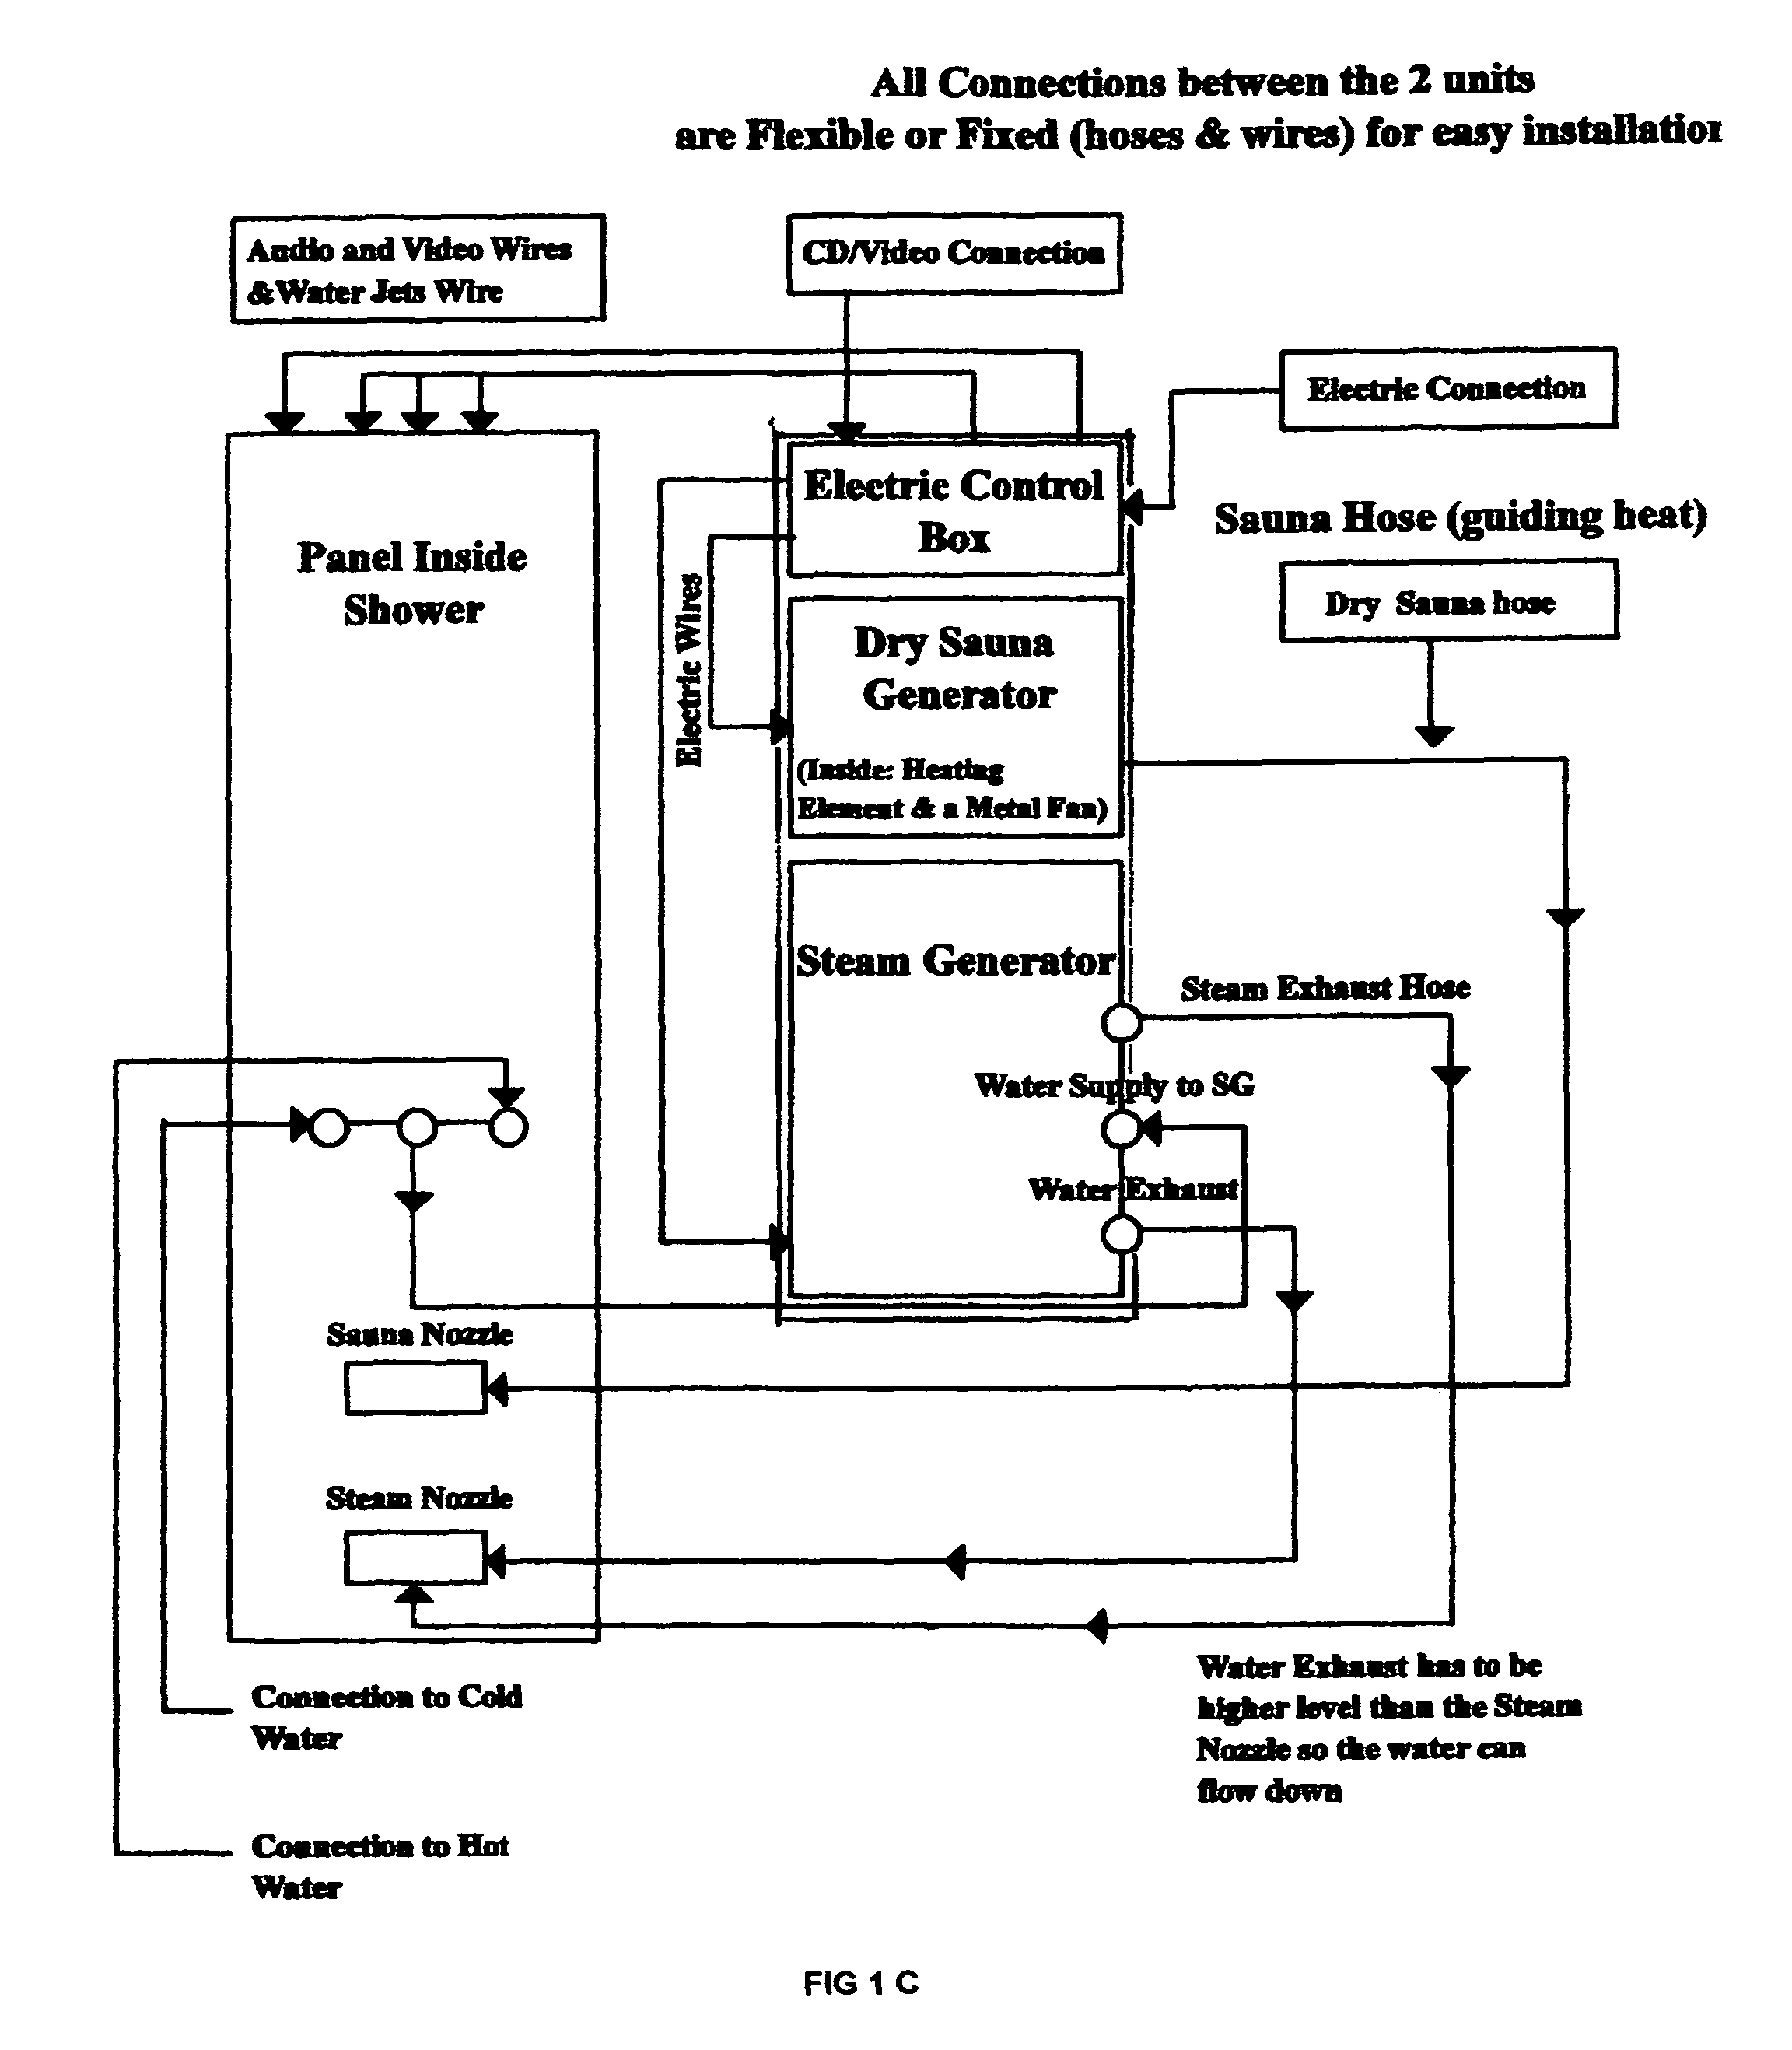 10 Kw Electric Heater Wiring Diagram Schematic Control Furnace Goodman